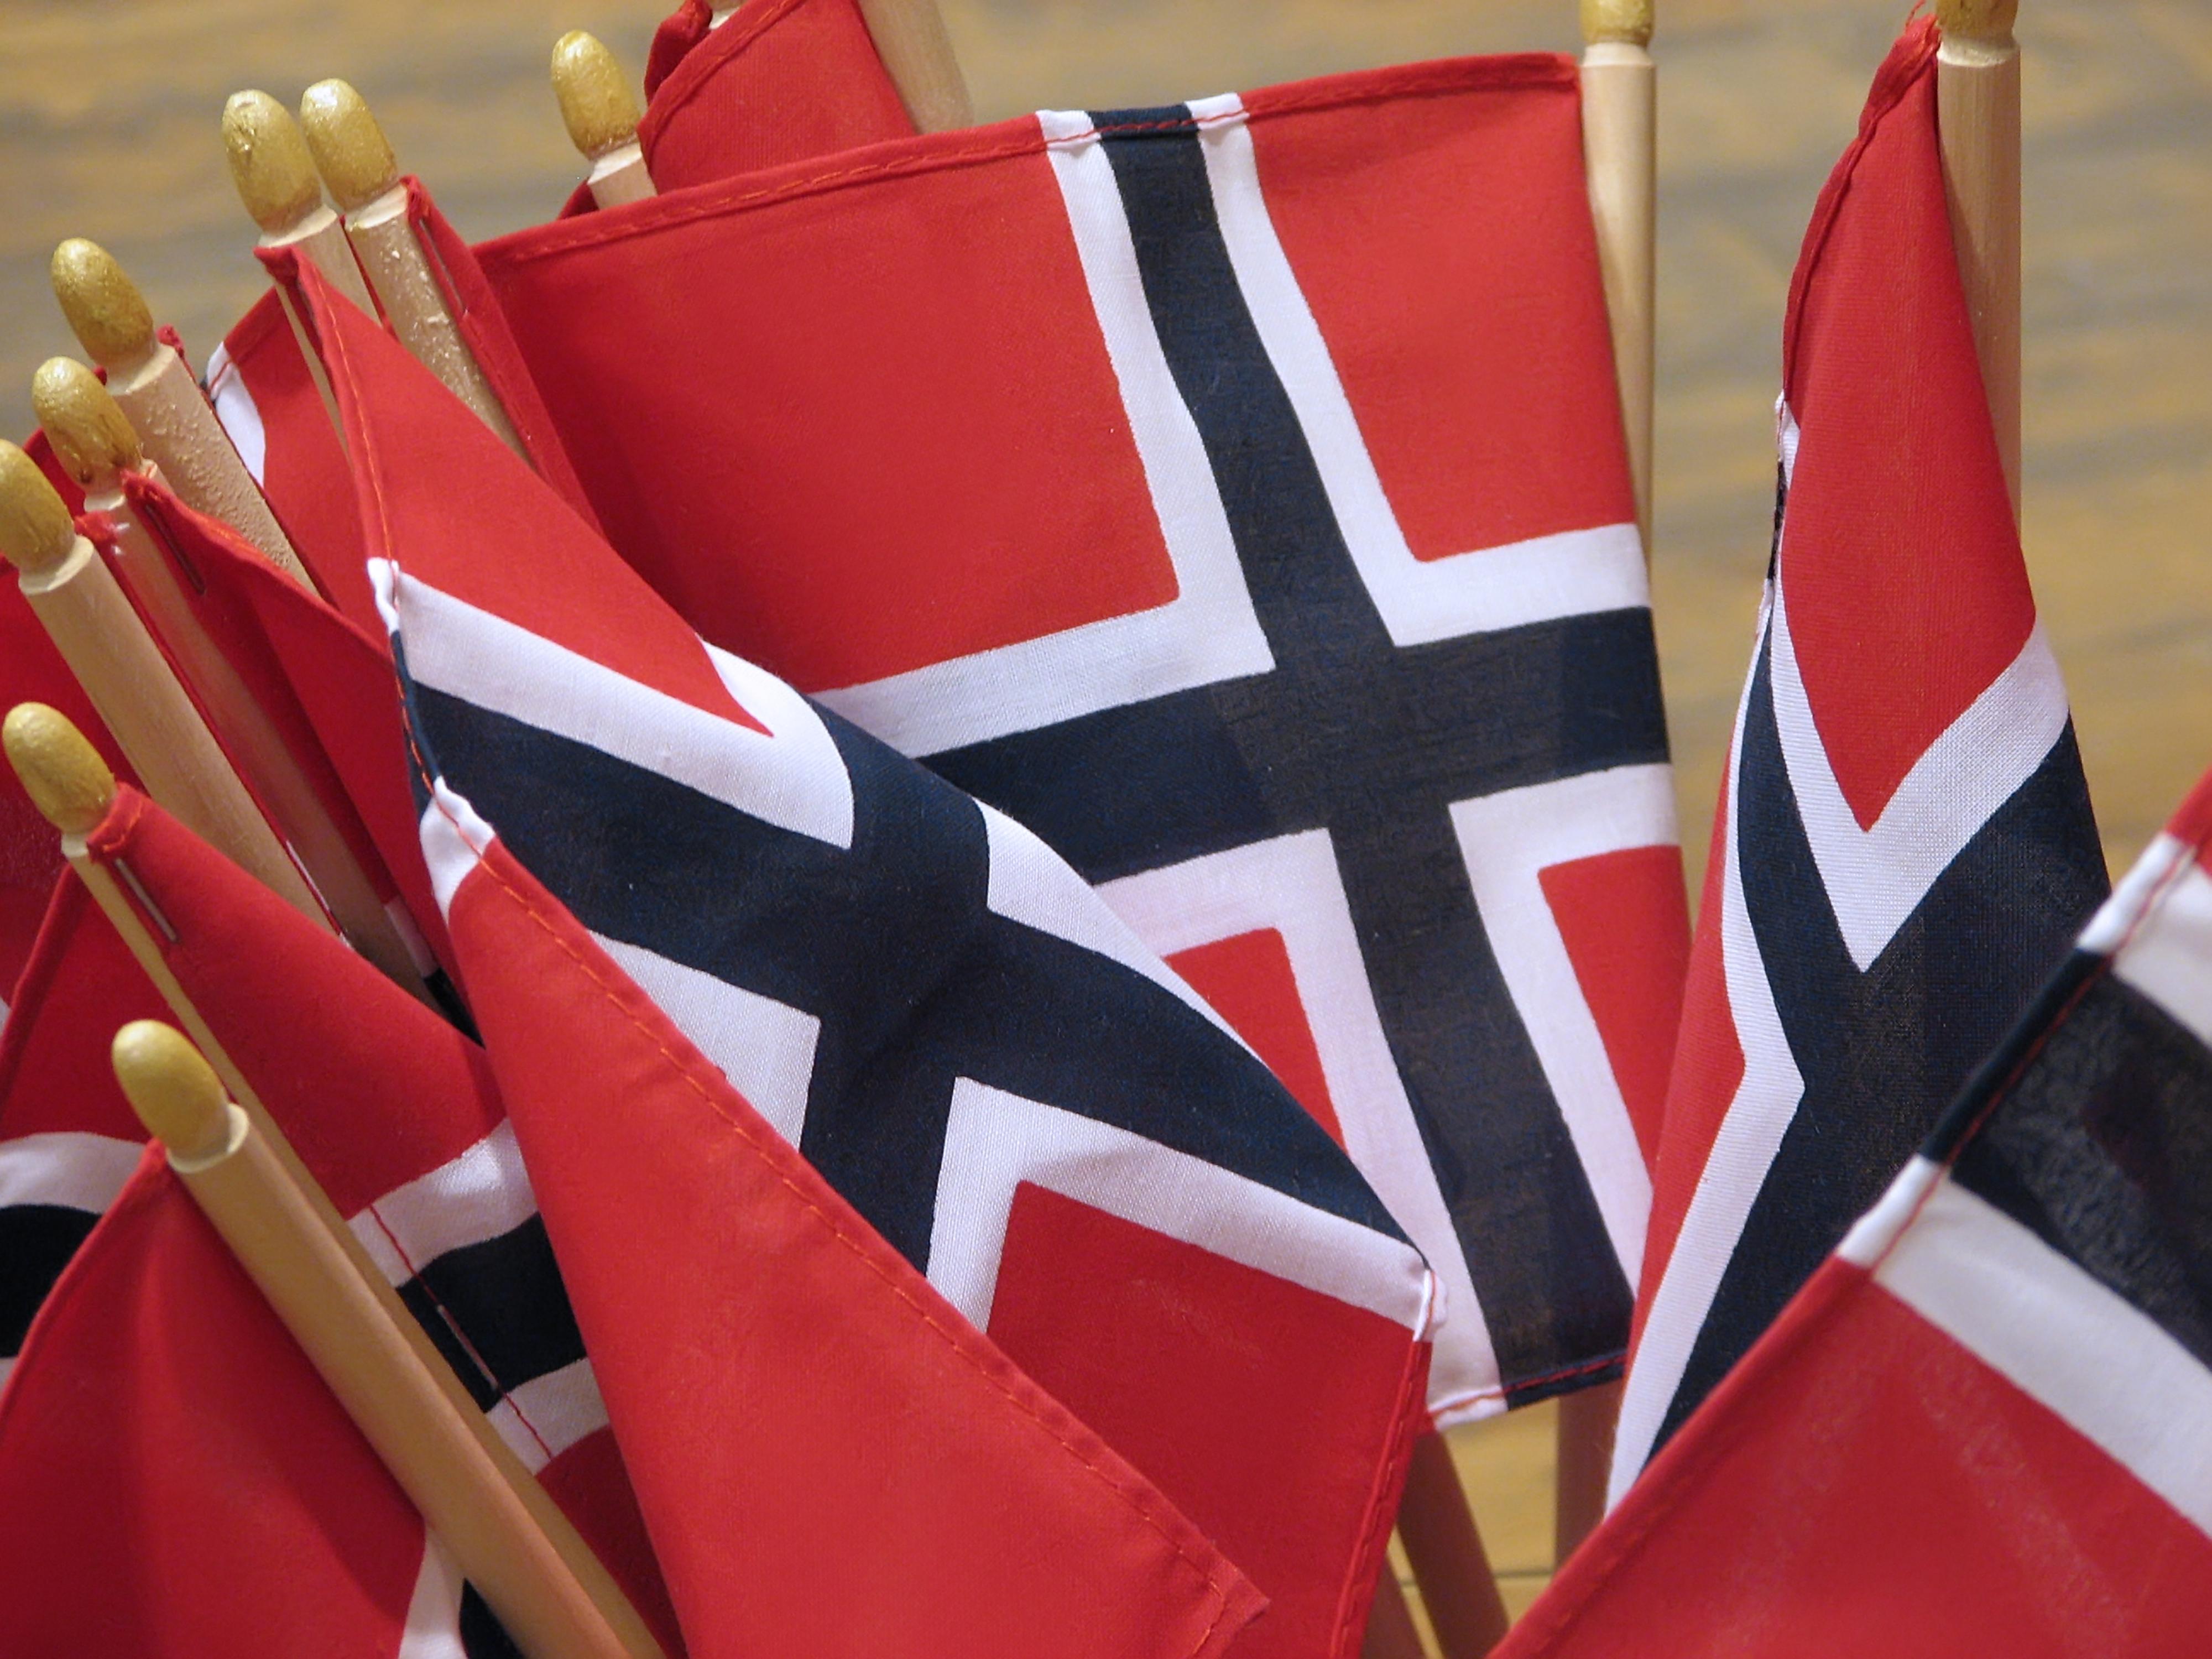 jeppesen to donate encs to norwegian society for sea rescue ship